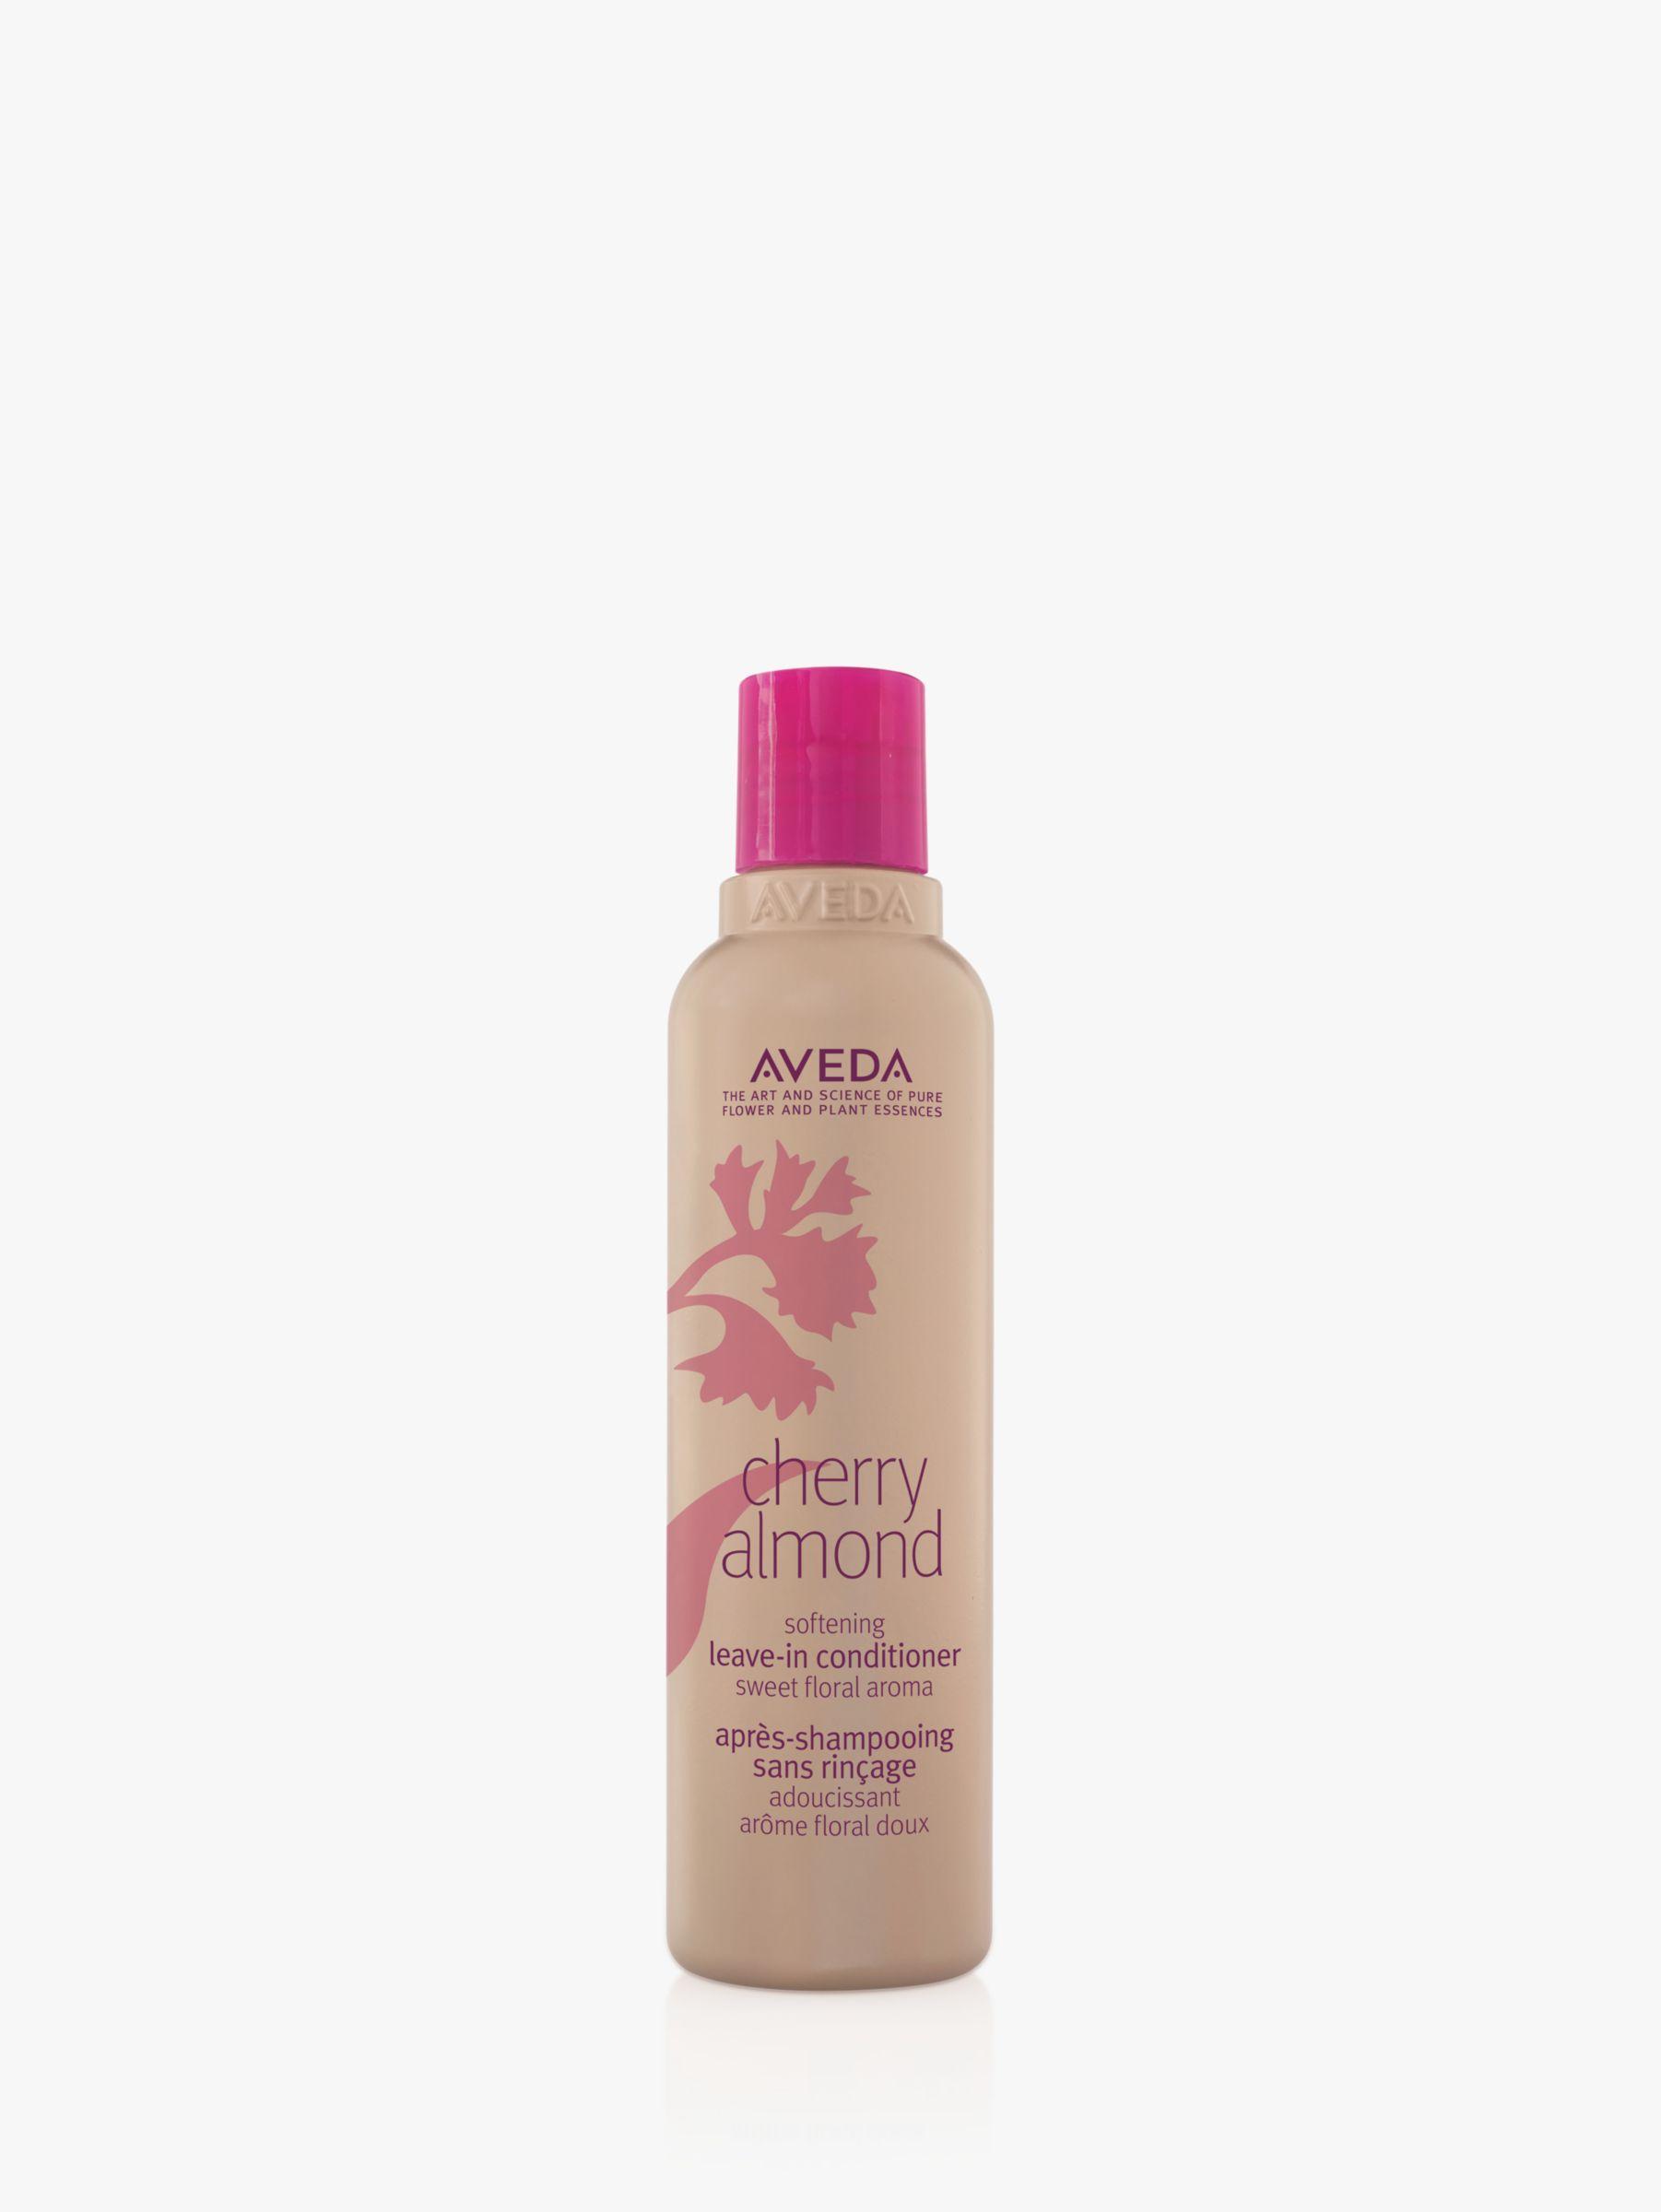 AVEDA Aveda Cherry Almond Leave-In Treat Conditioner, 200ml